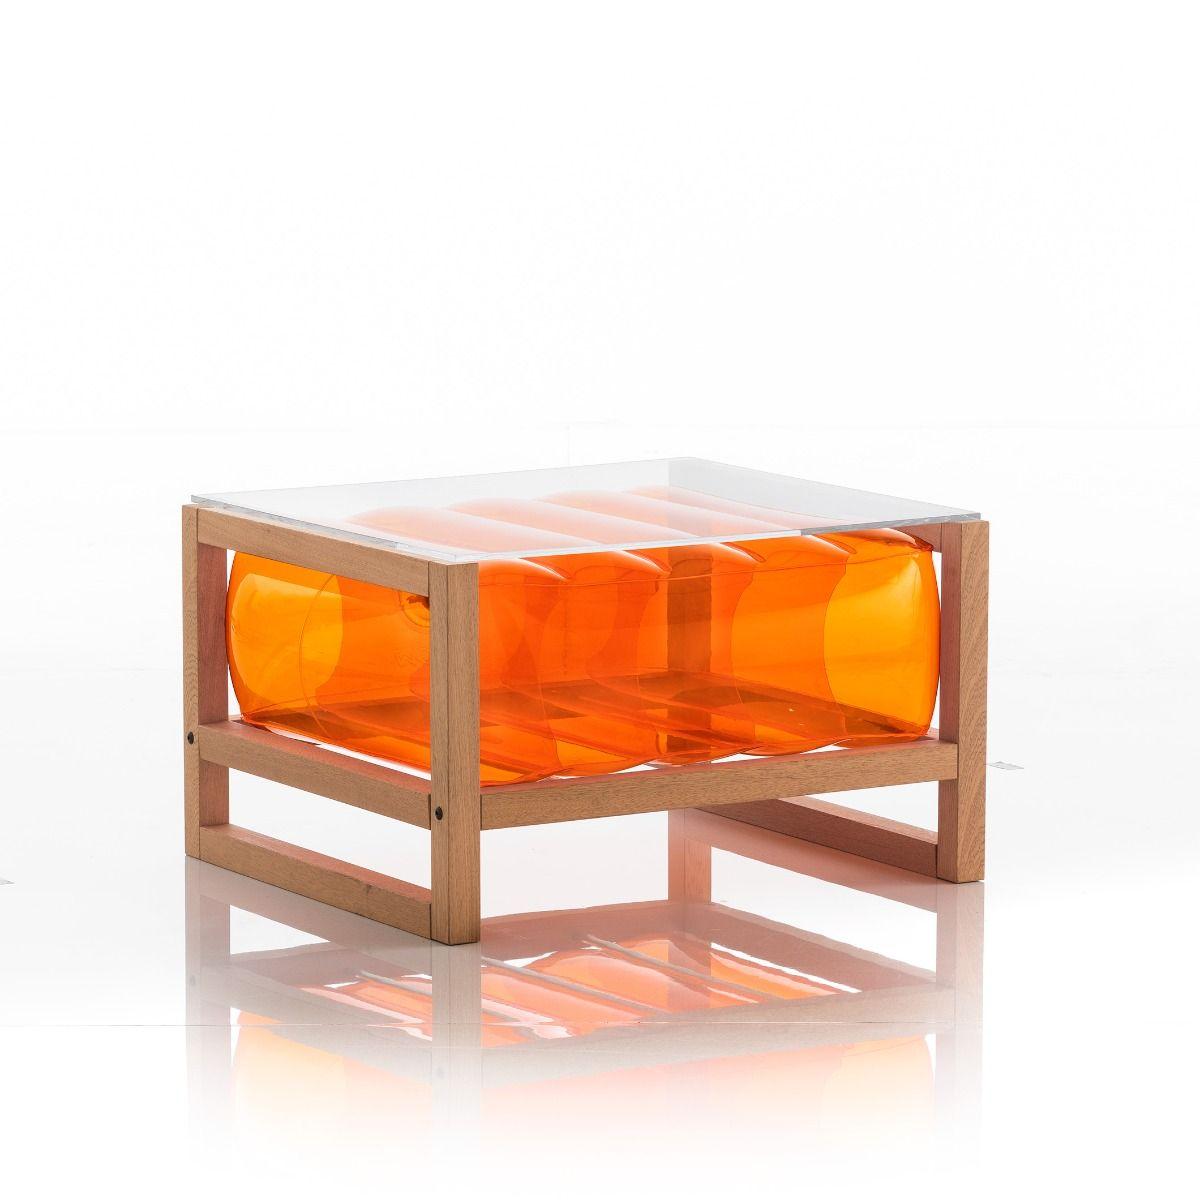 Table basse en bois et tpu orange